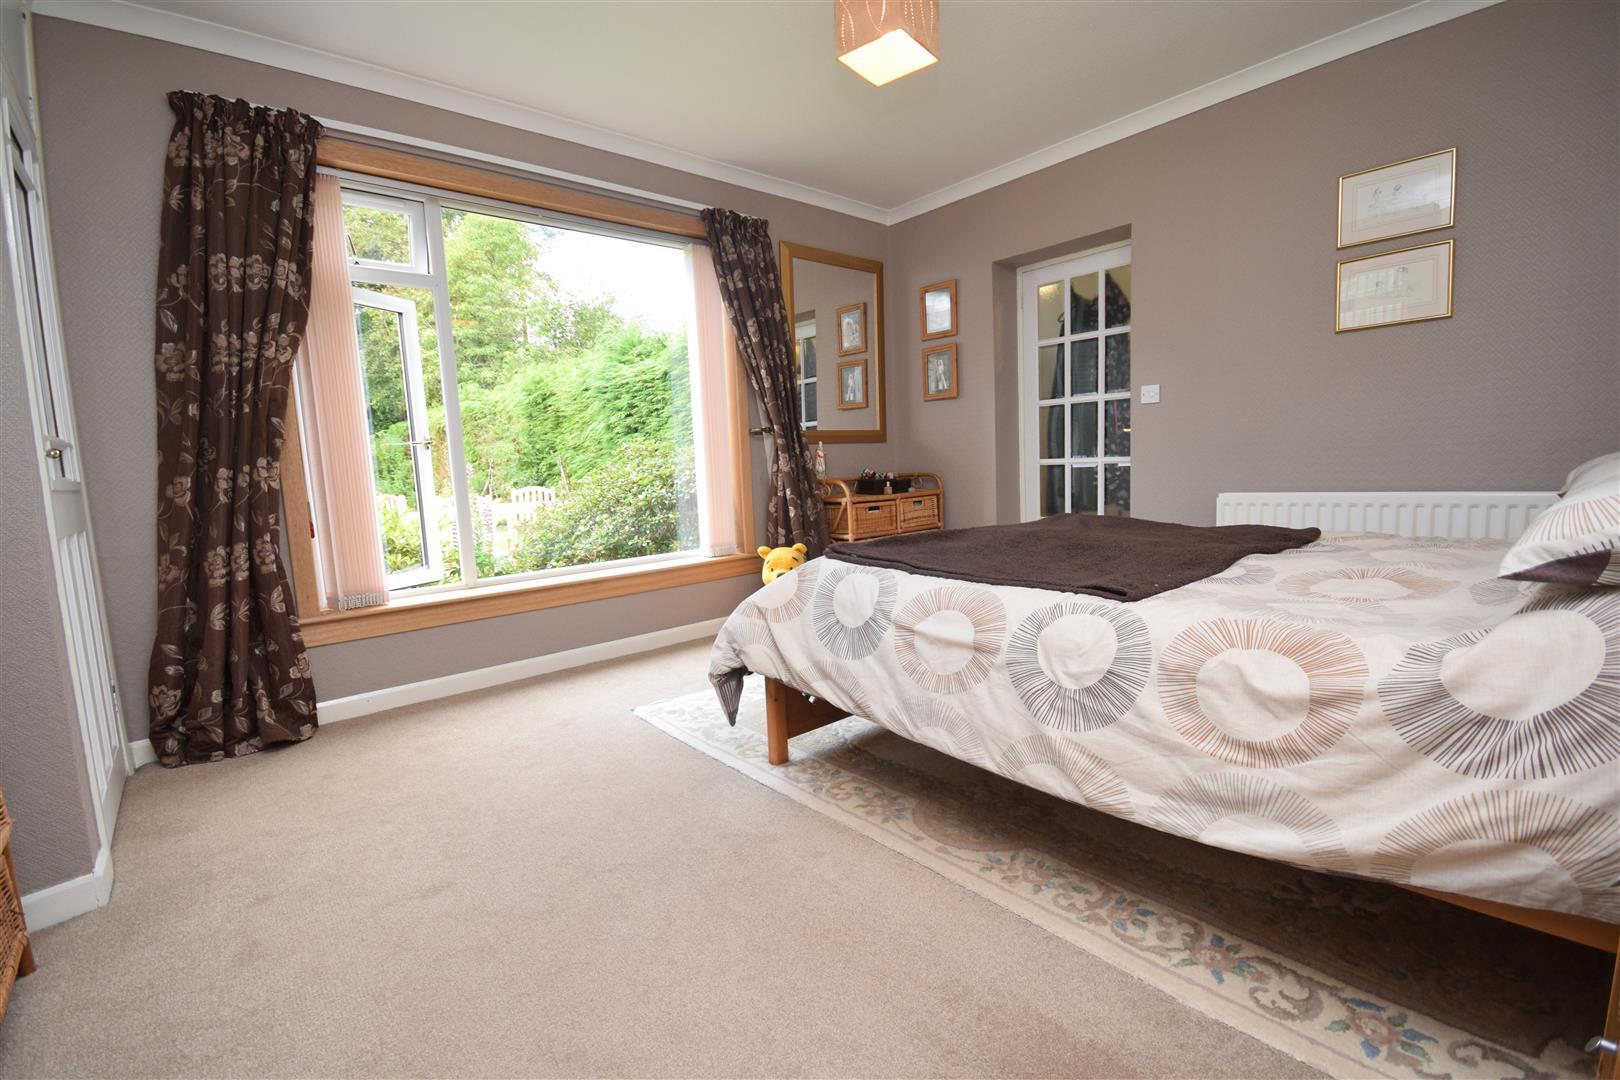 Moorhaze, Heather Drive, Rosemount, Blairgowrie, Perthshire, PH10 6LN, UK